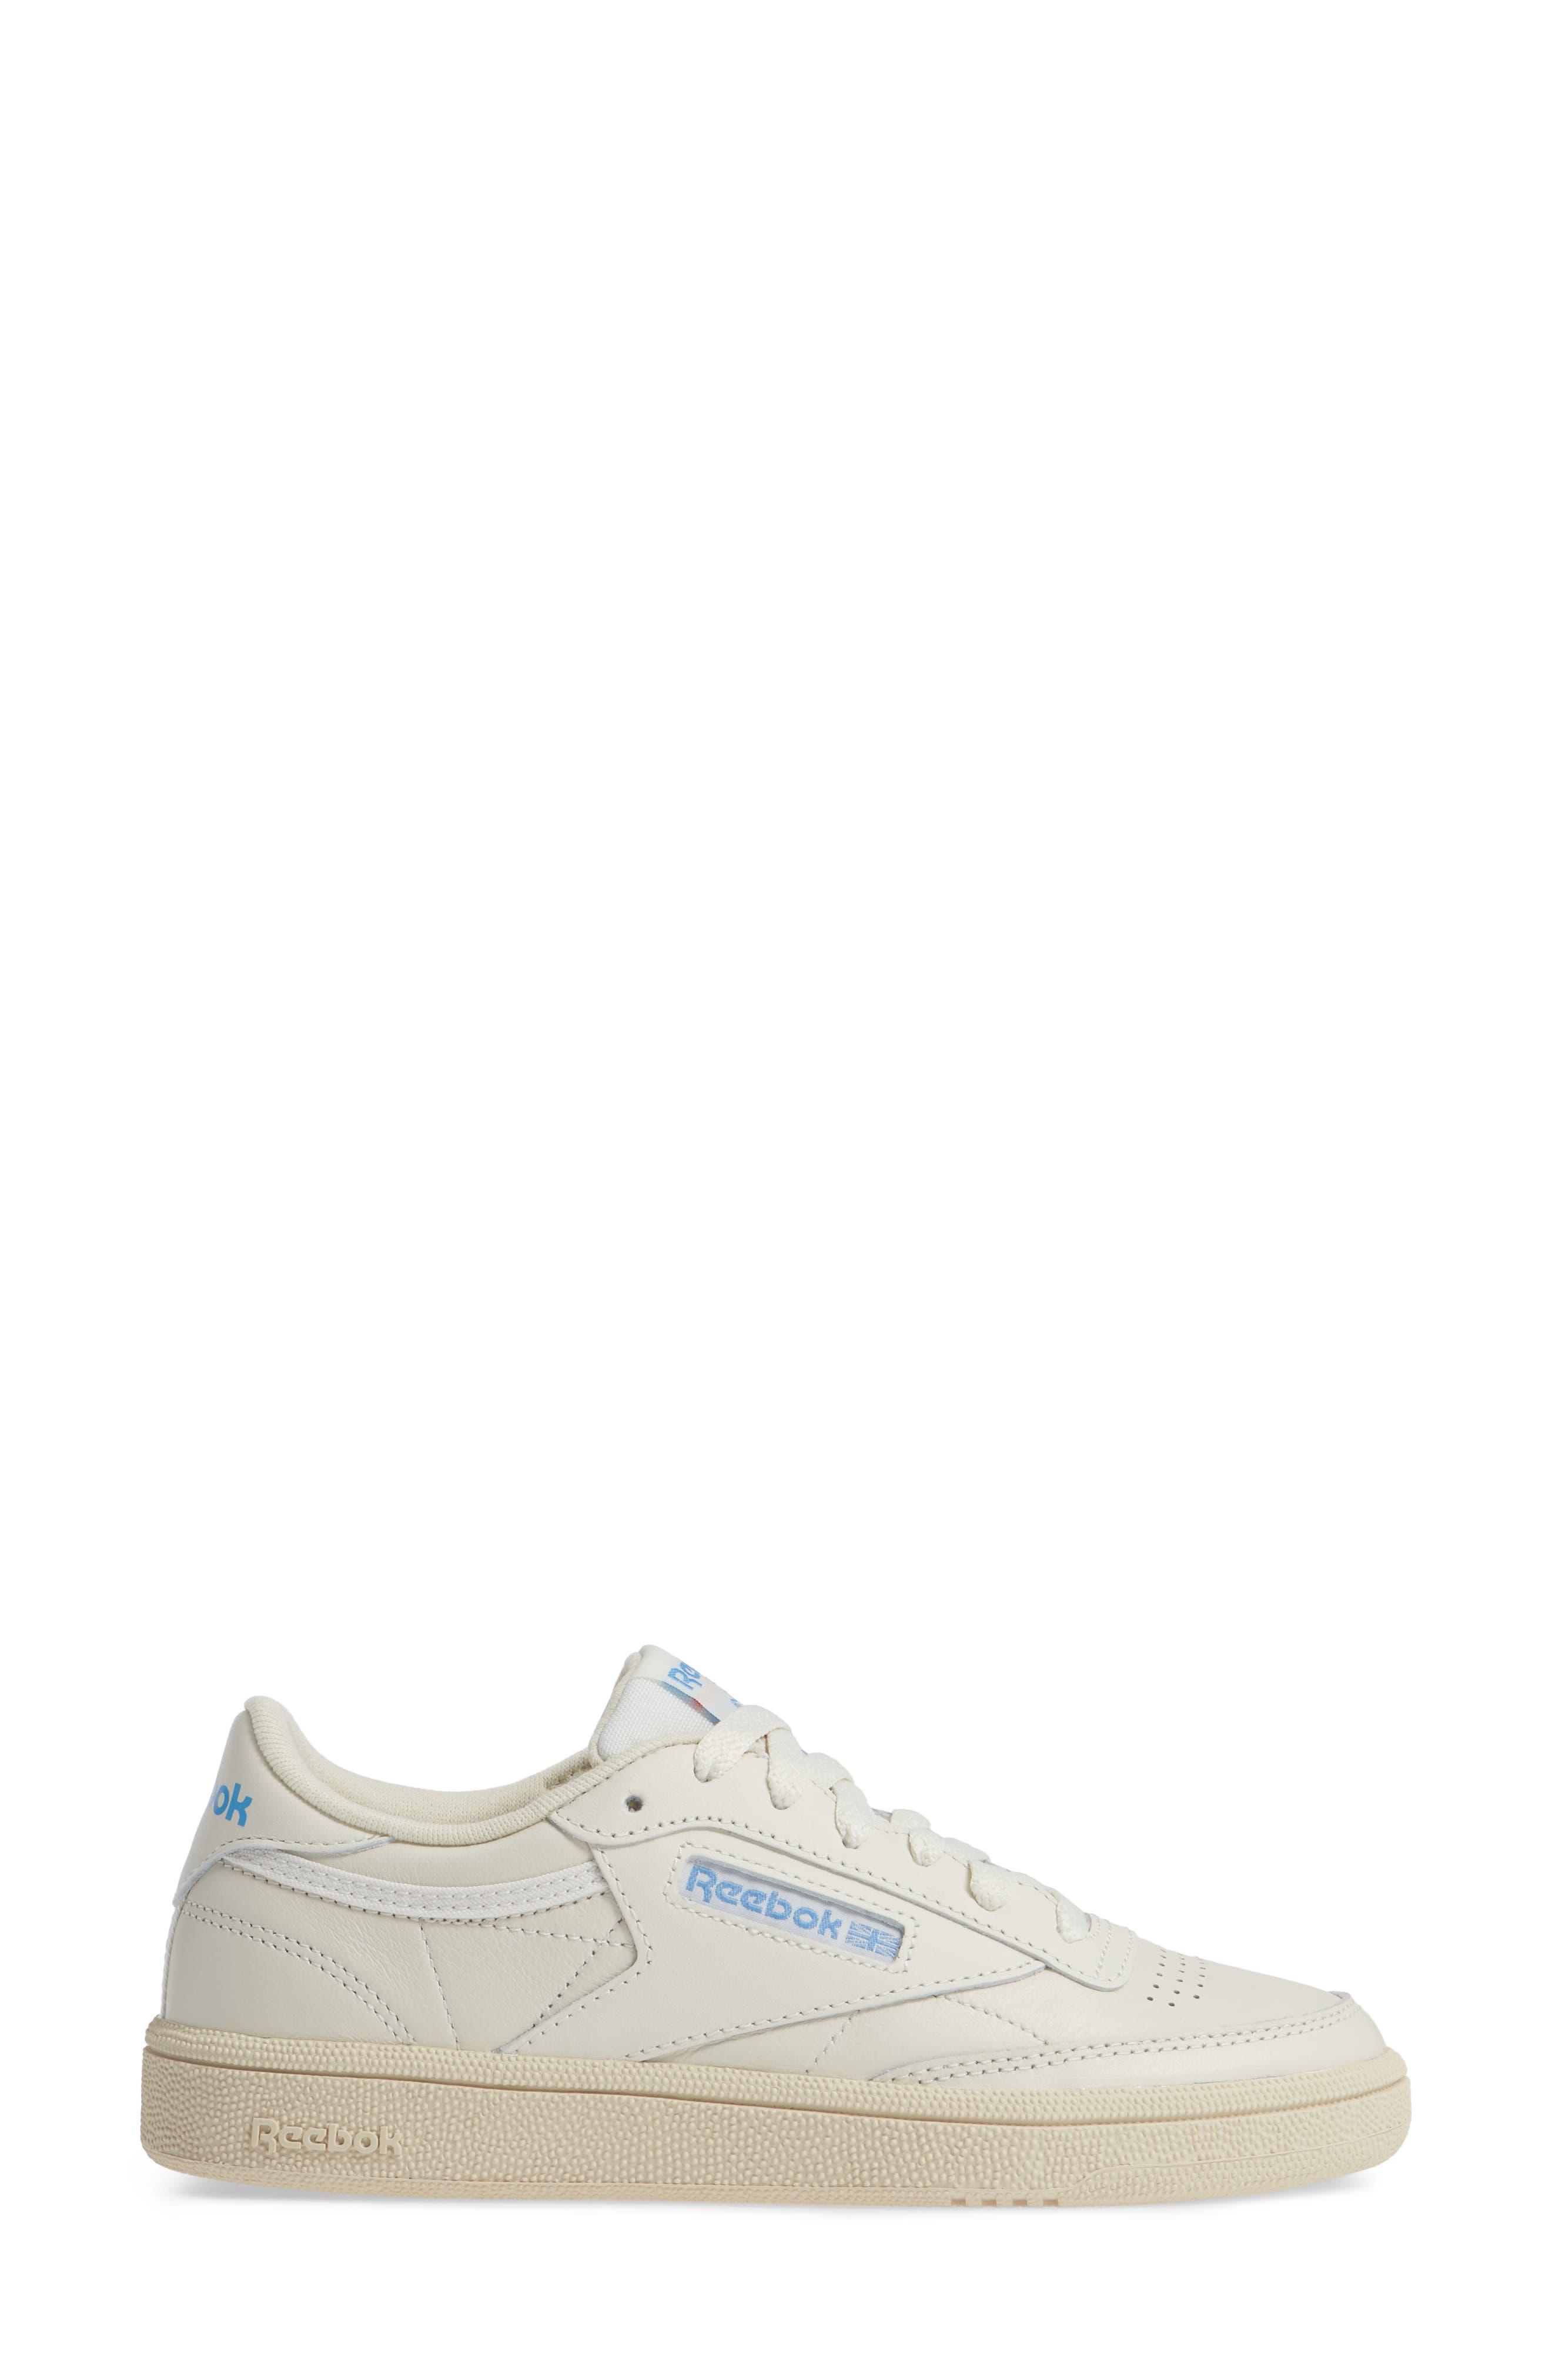 Club C 85 Sneaker,                             Alternate thumbnail 3, color,                             CHALK/ WHITE/ BLUE/ RED